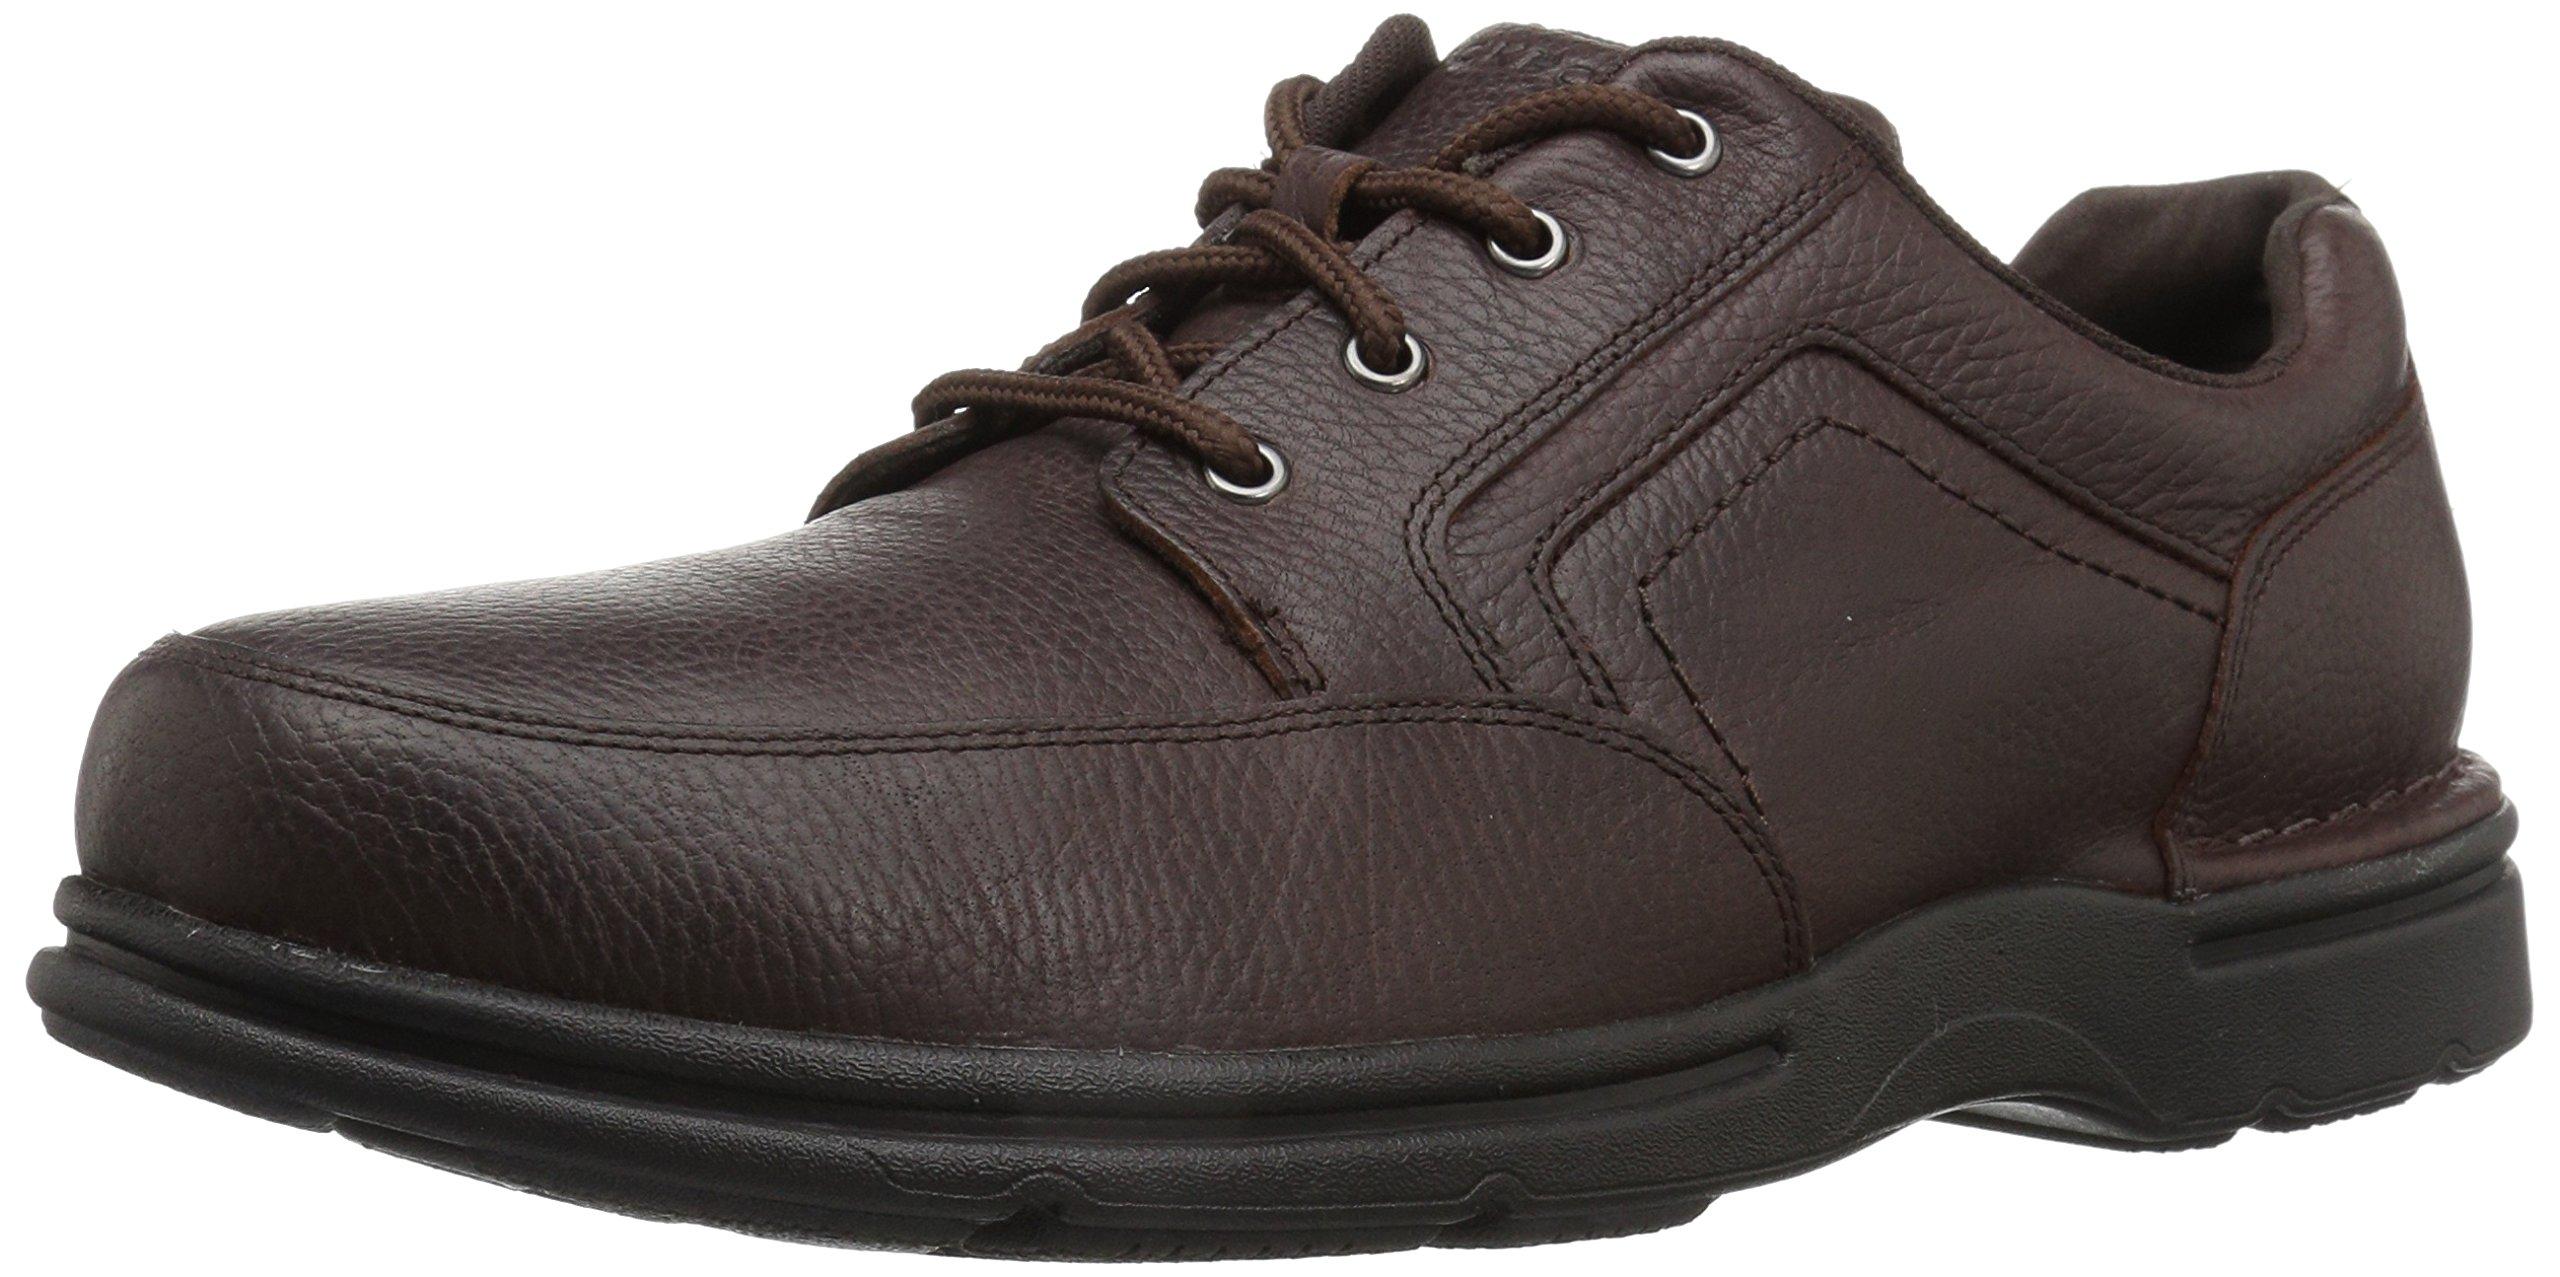 Rockport Men's Eureka Plus Mudguard Oxford, Dark Brown, 13 W US